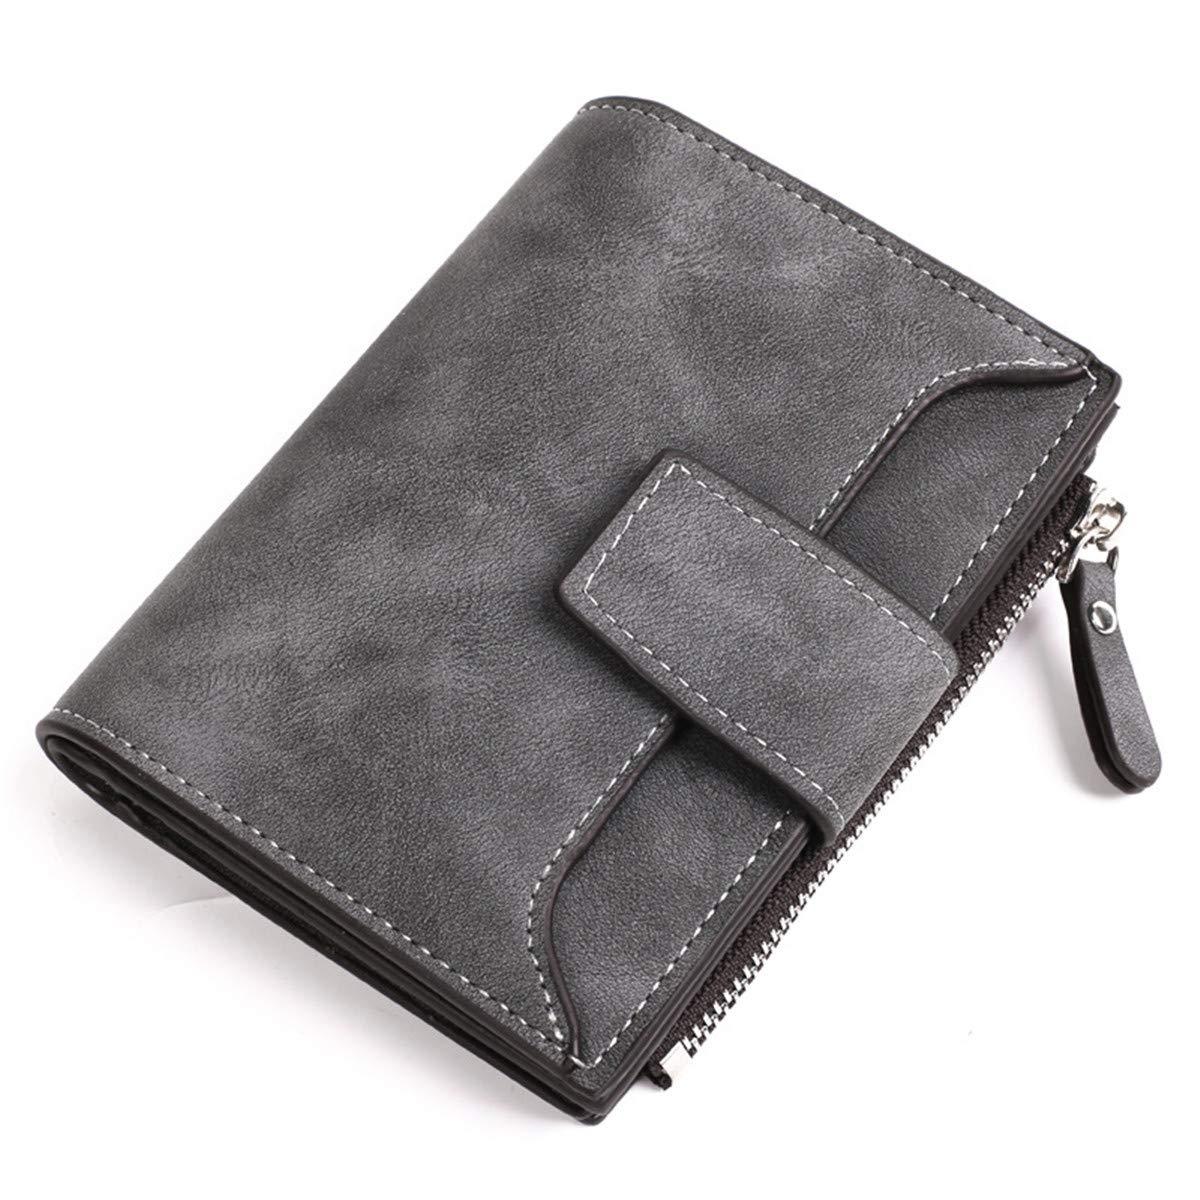 Women's Wallet Leather Long Bifold RFID Blocking Wallet by MINIKATA